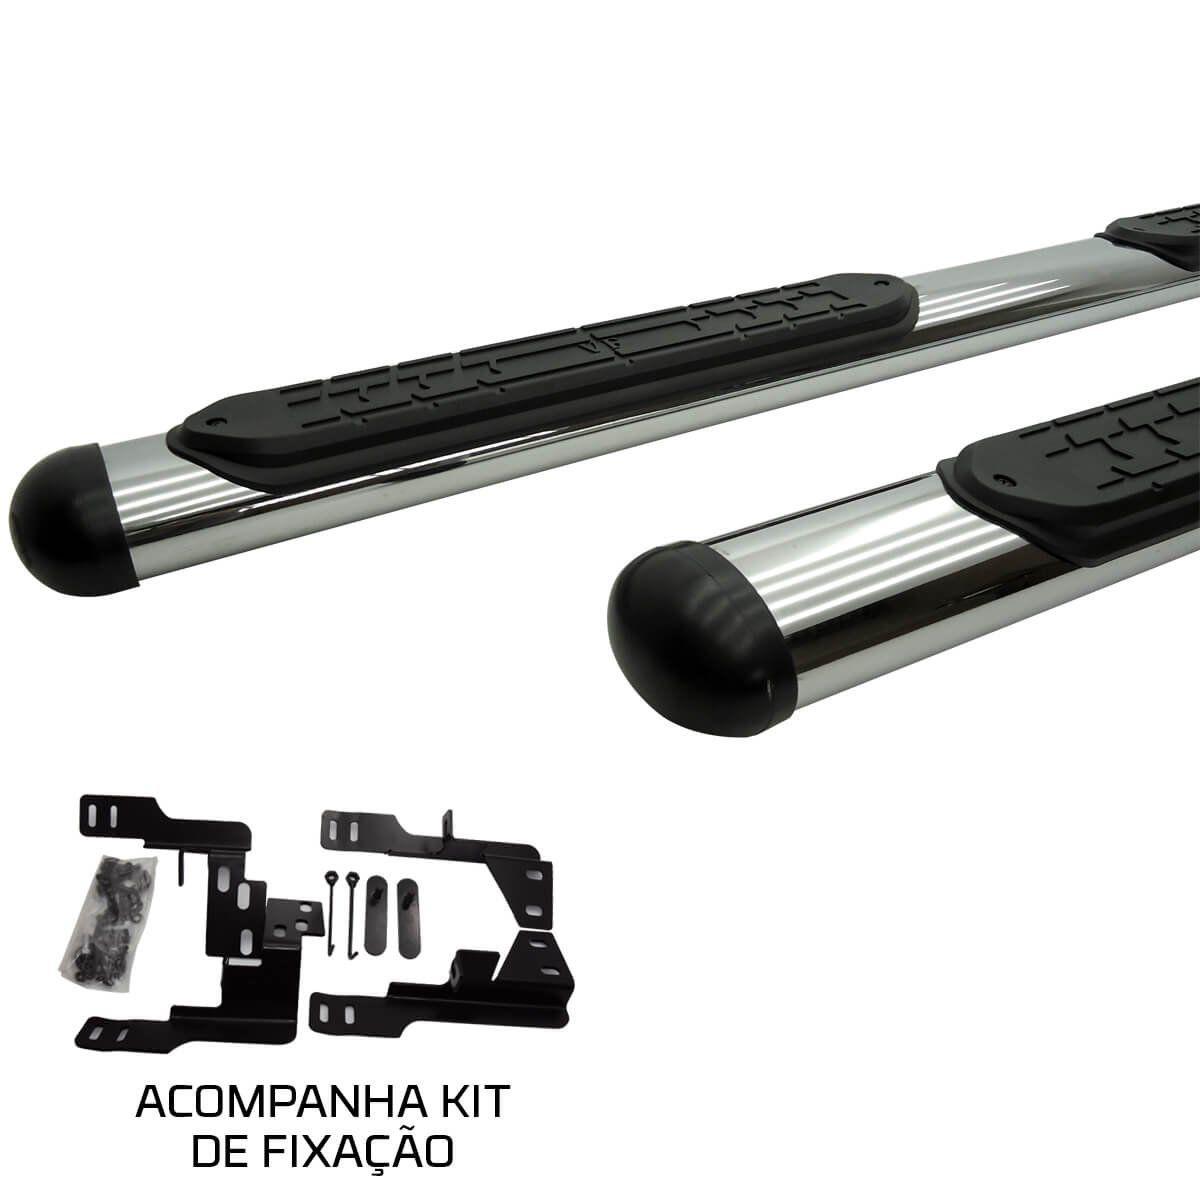 Estribo oval cromado Nova S10 cabine dupla 2012 a 2020